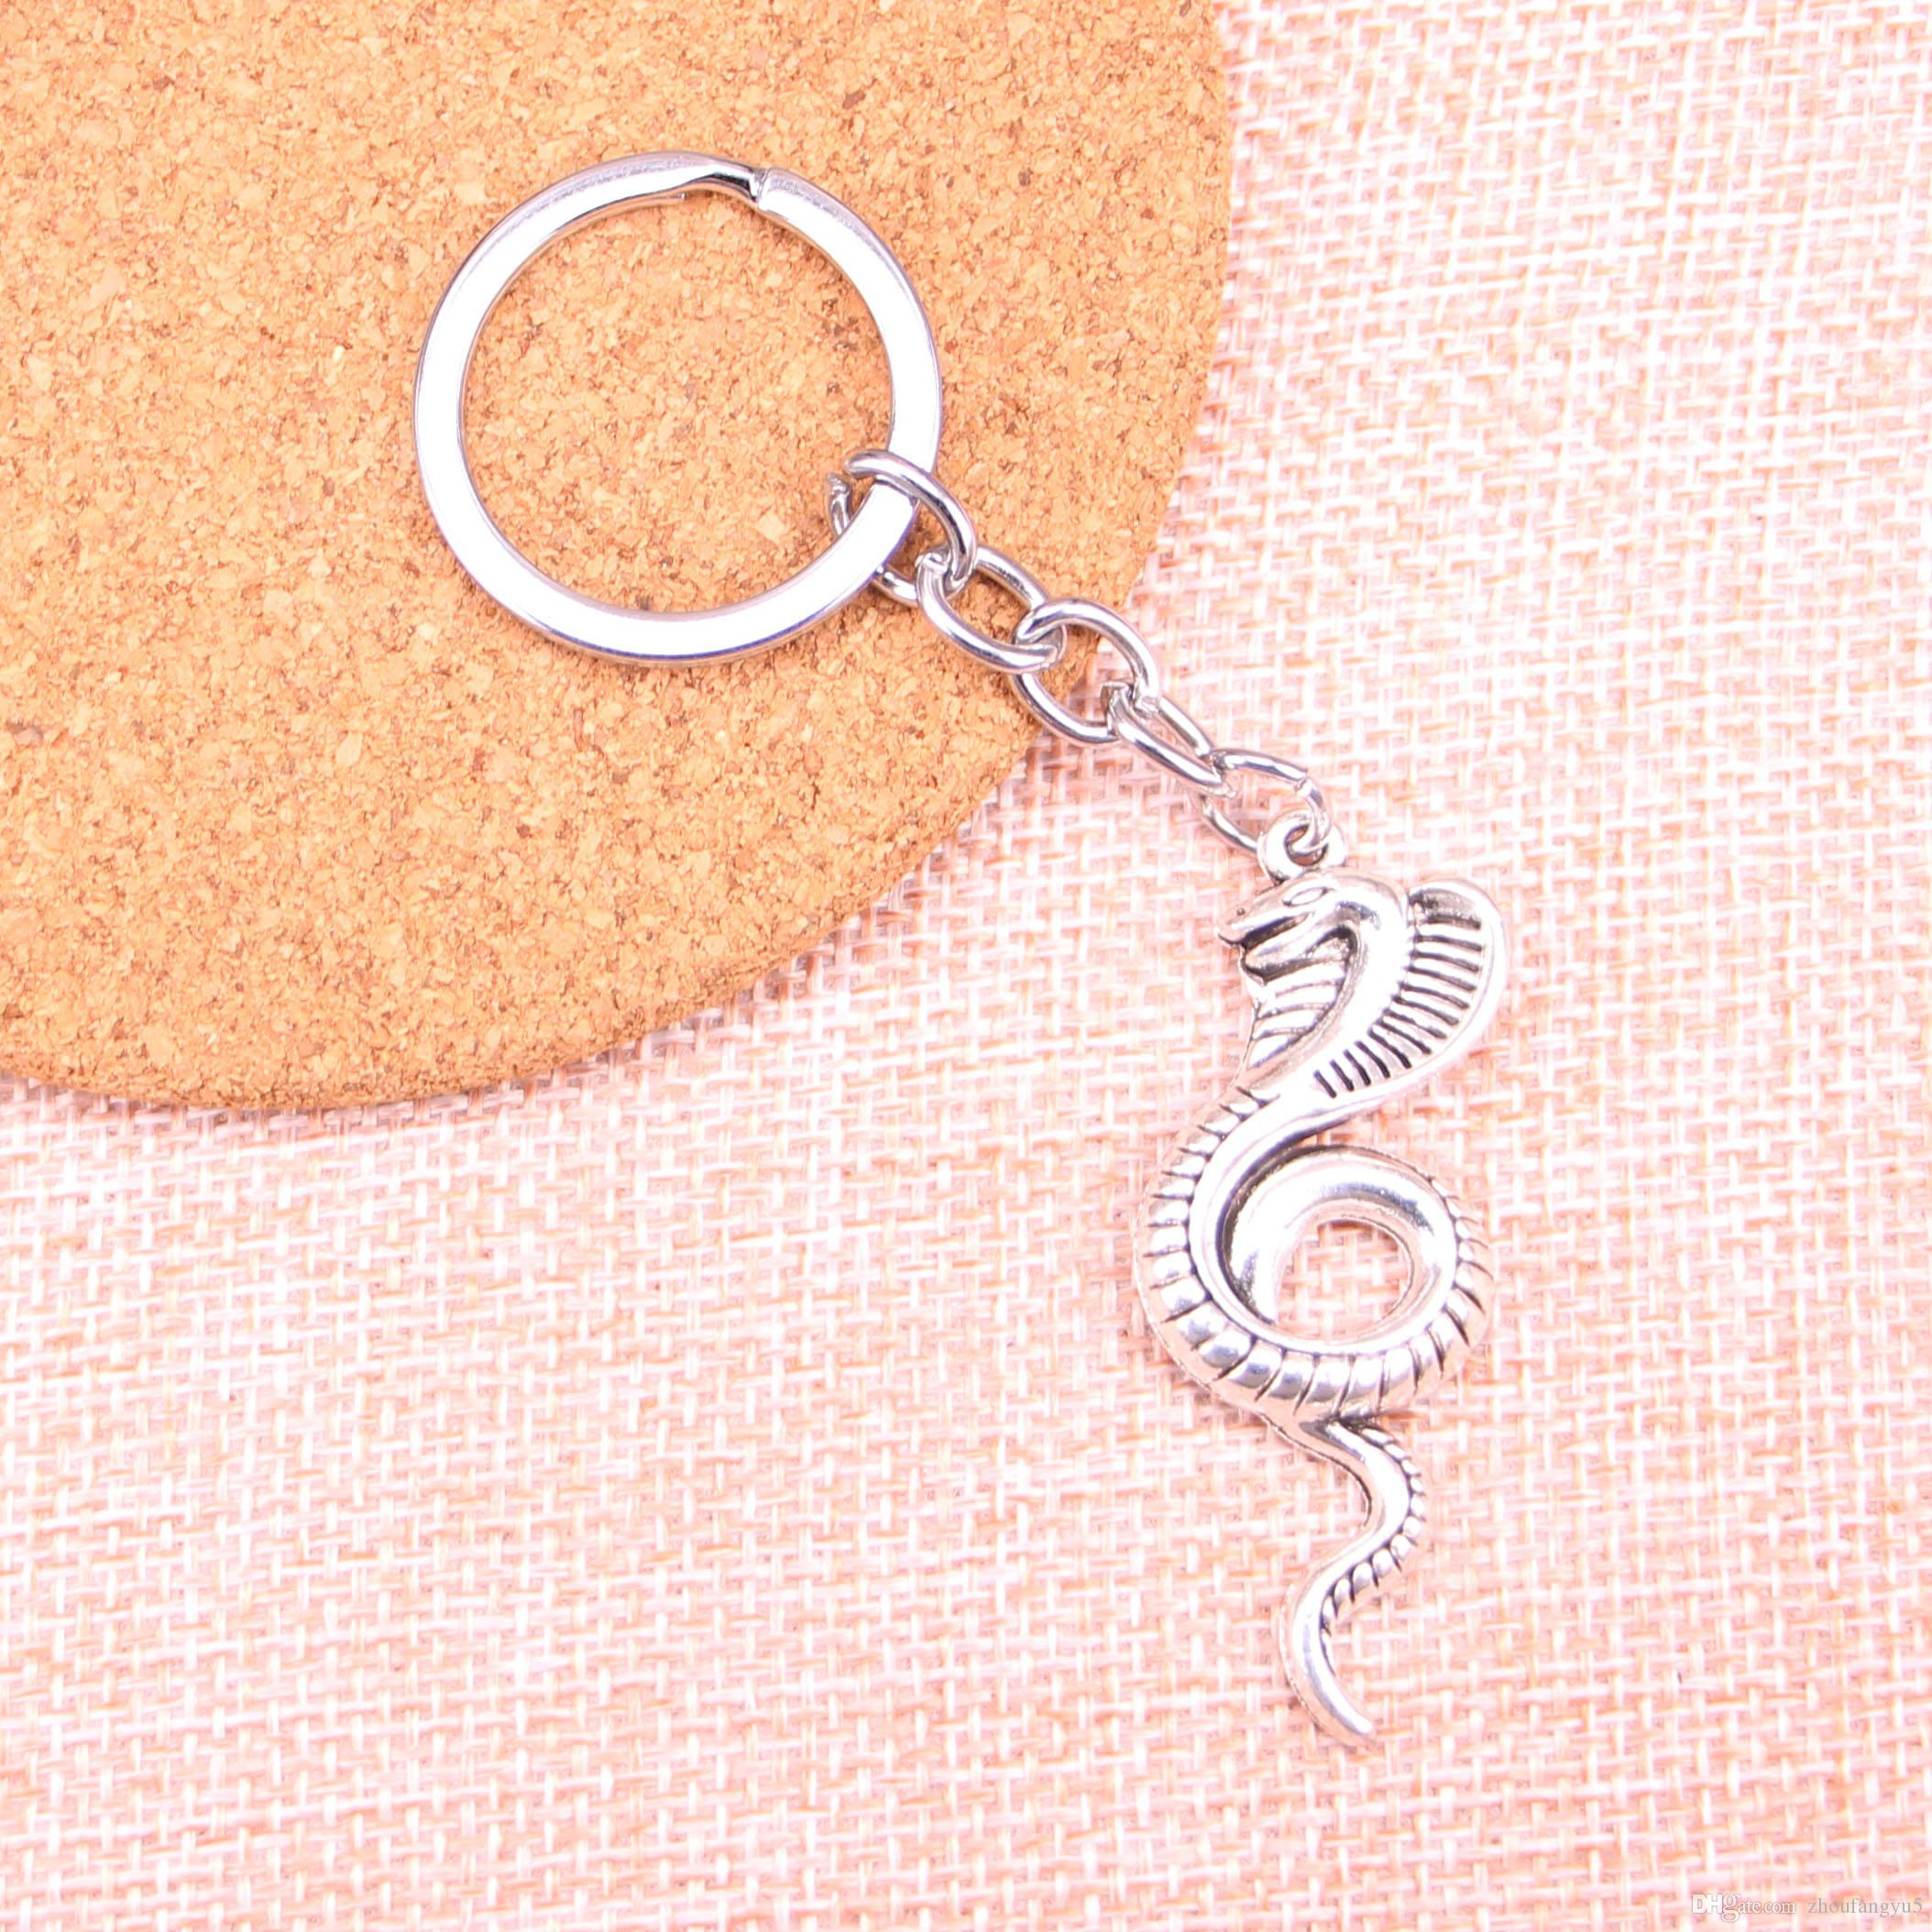 New Keychain 49*19mm king cobra snake Pendants DIY Men Car Key Chain Ring Holder Keyring Souvenir Jewelry Gift